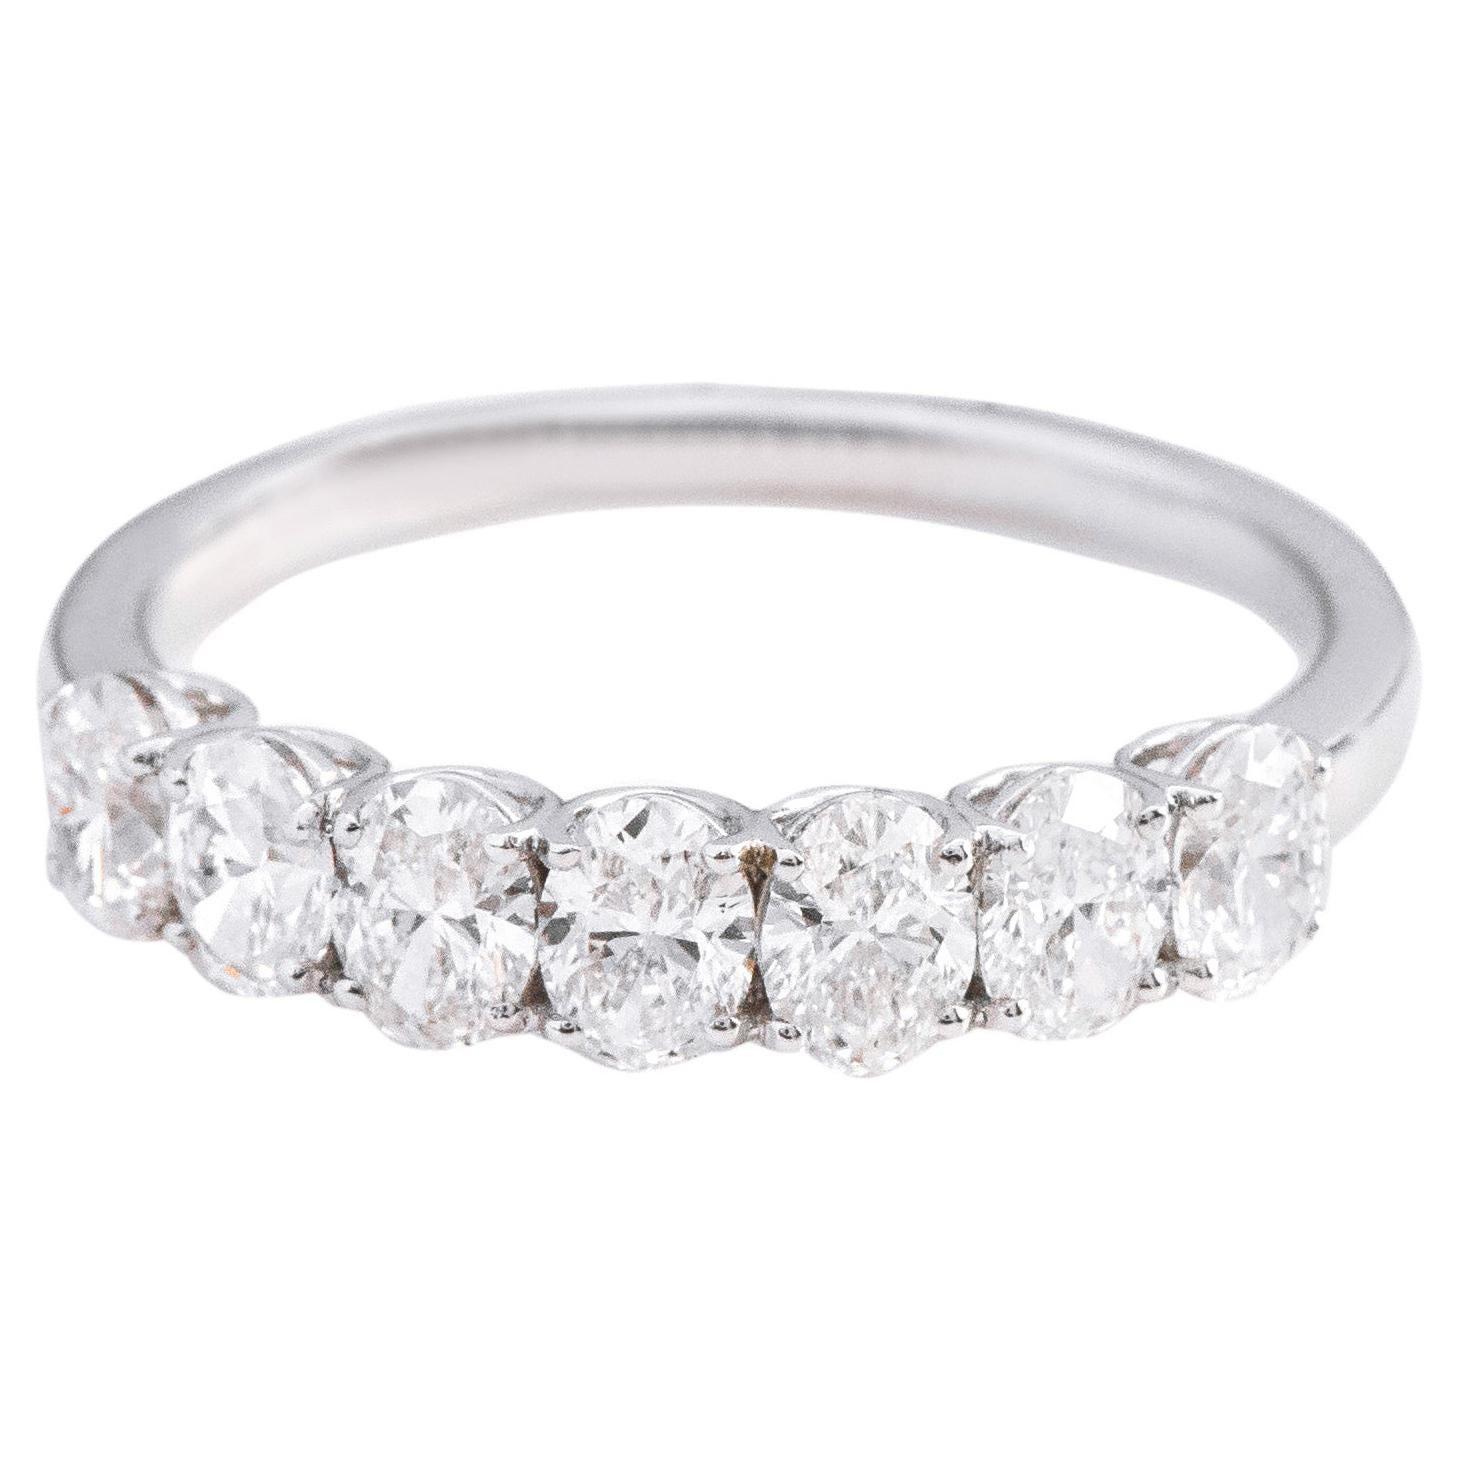 18 Karat Gold 1.27 Carat Solitaire Oval-Cut Diamond Half Band Eternity Ring